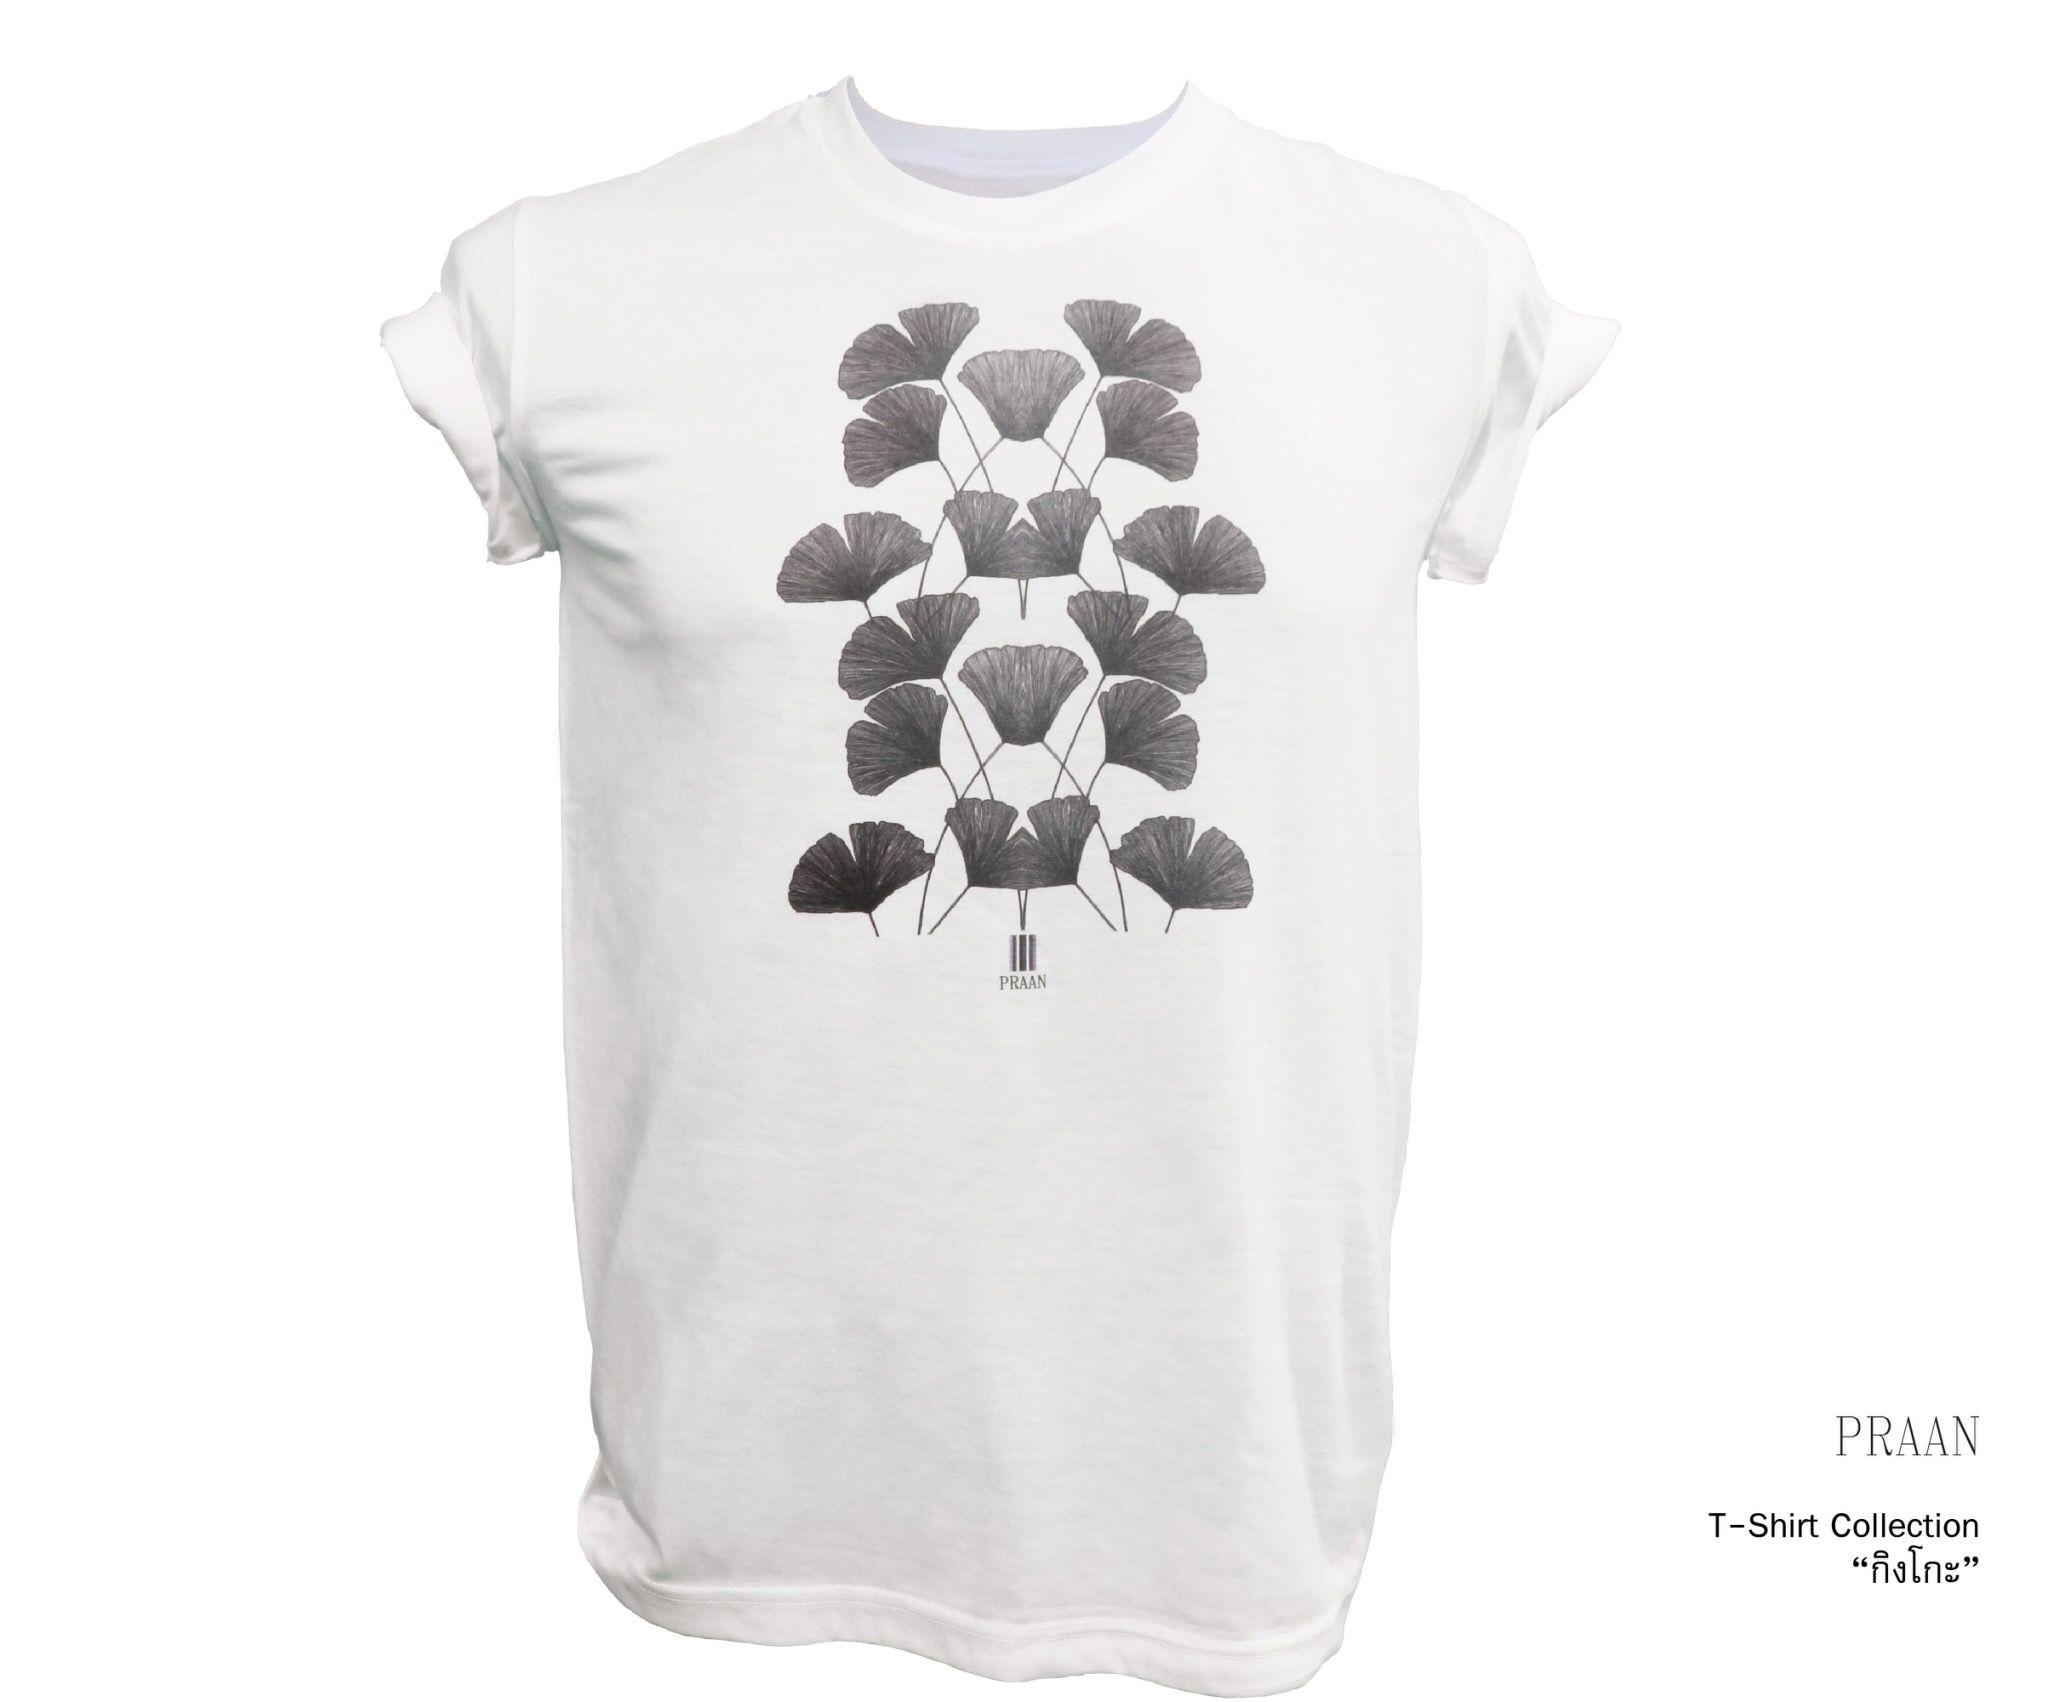 T shirt handmade design - Praan T Shirt Handmade T Shirt Design Sketch Drawing Fashion